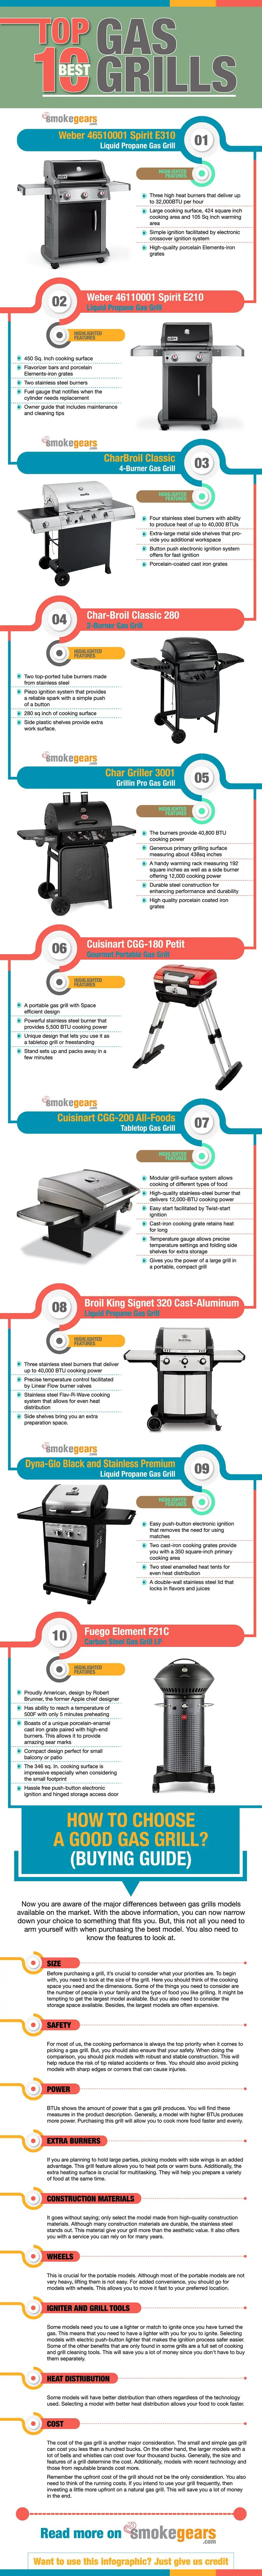 Top 10 Best Gas Grills Infographic Design